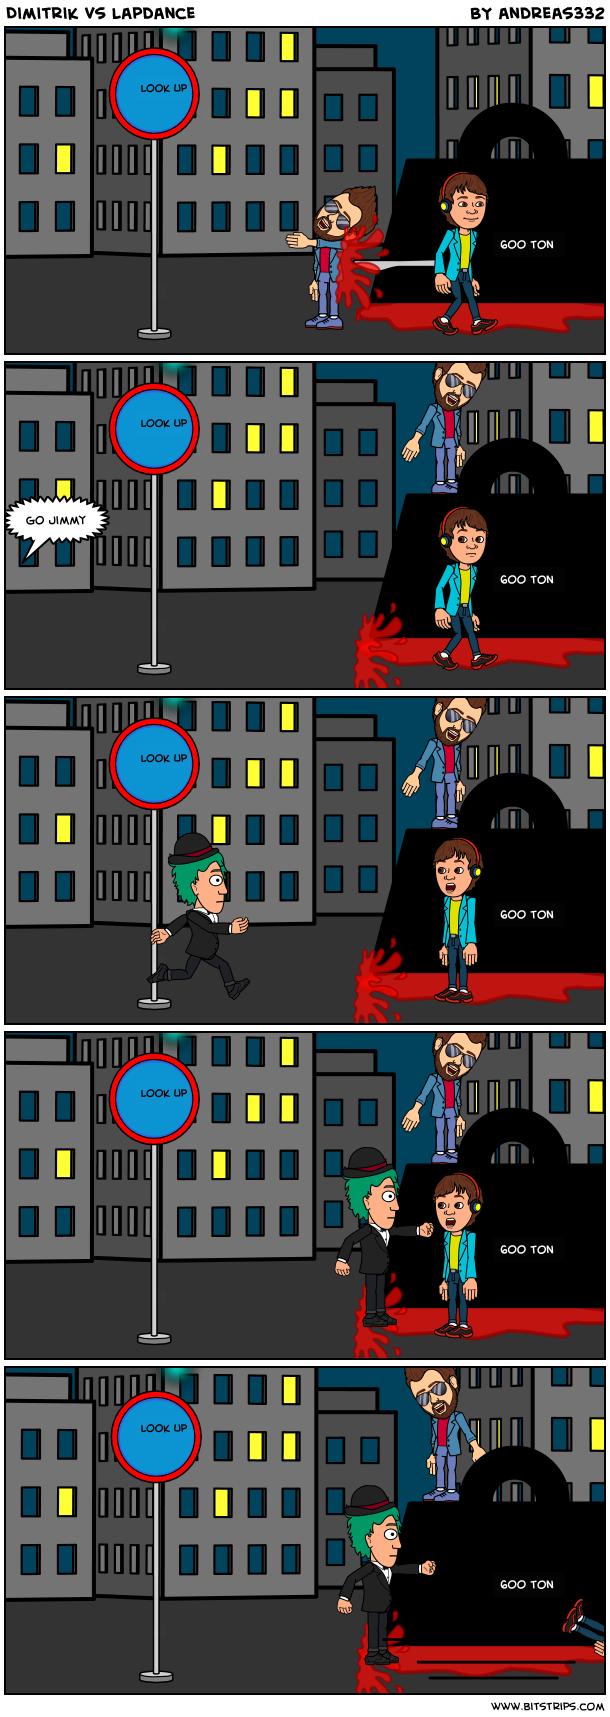 Dimitrik vs lapdance